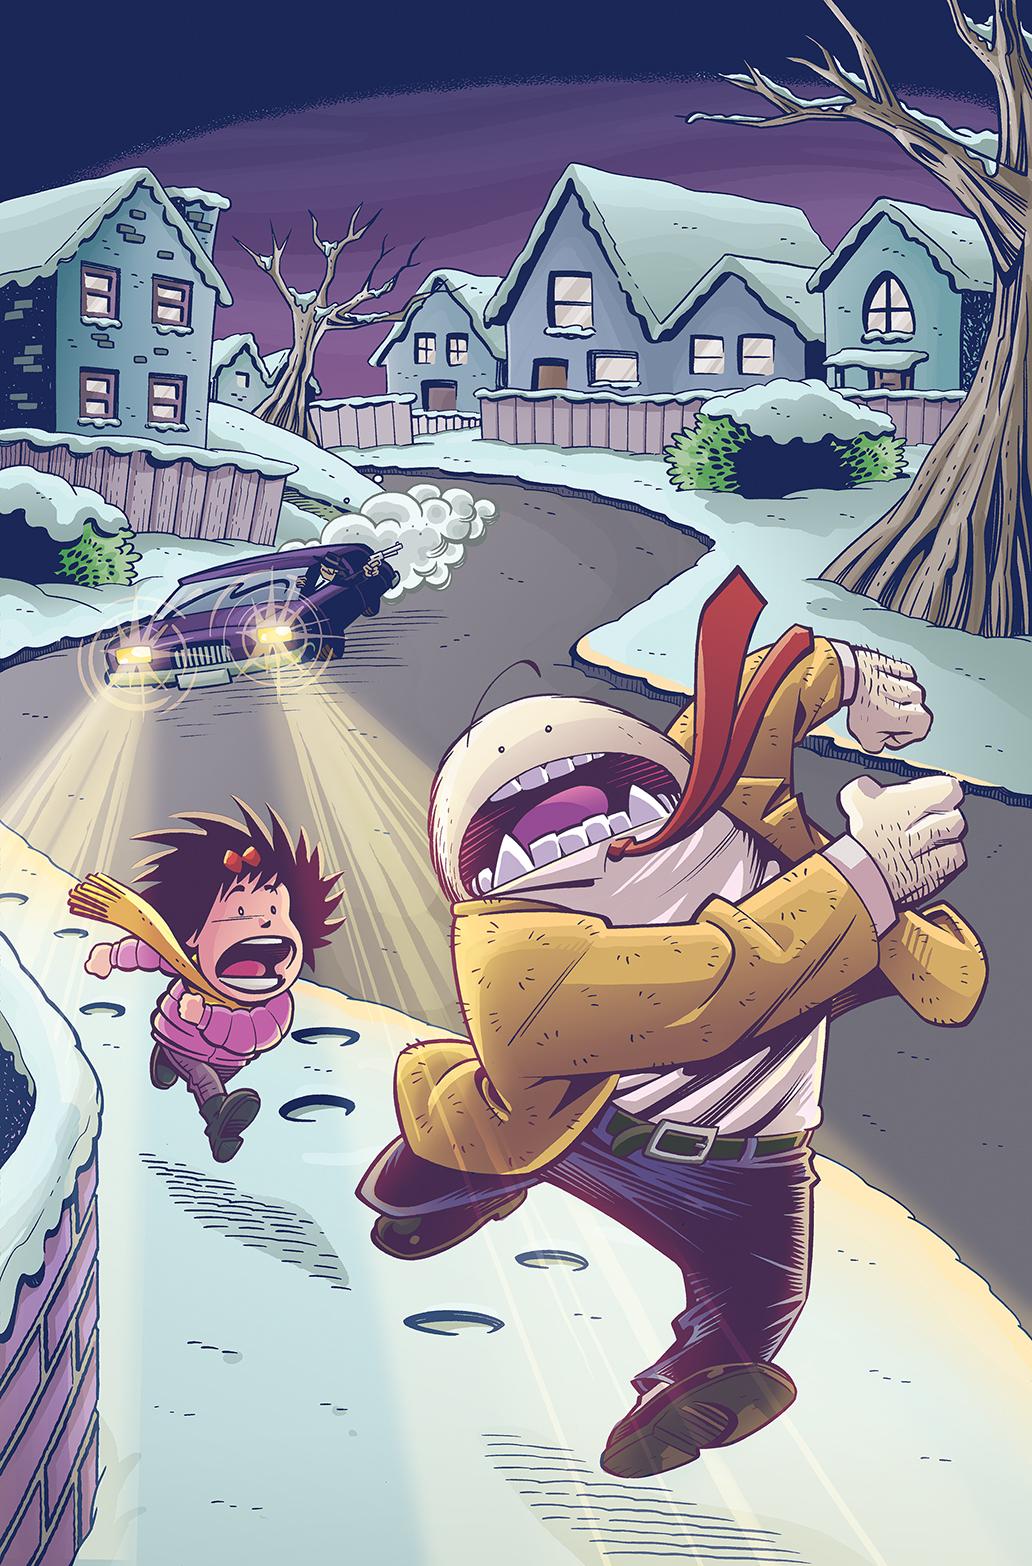 KABOOM_Abigail_and_the_Snowman_004